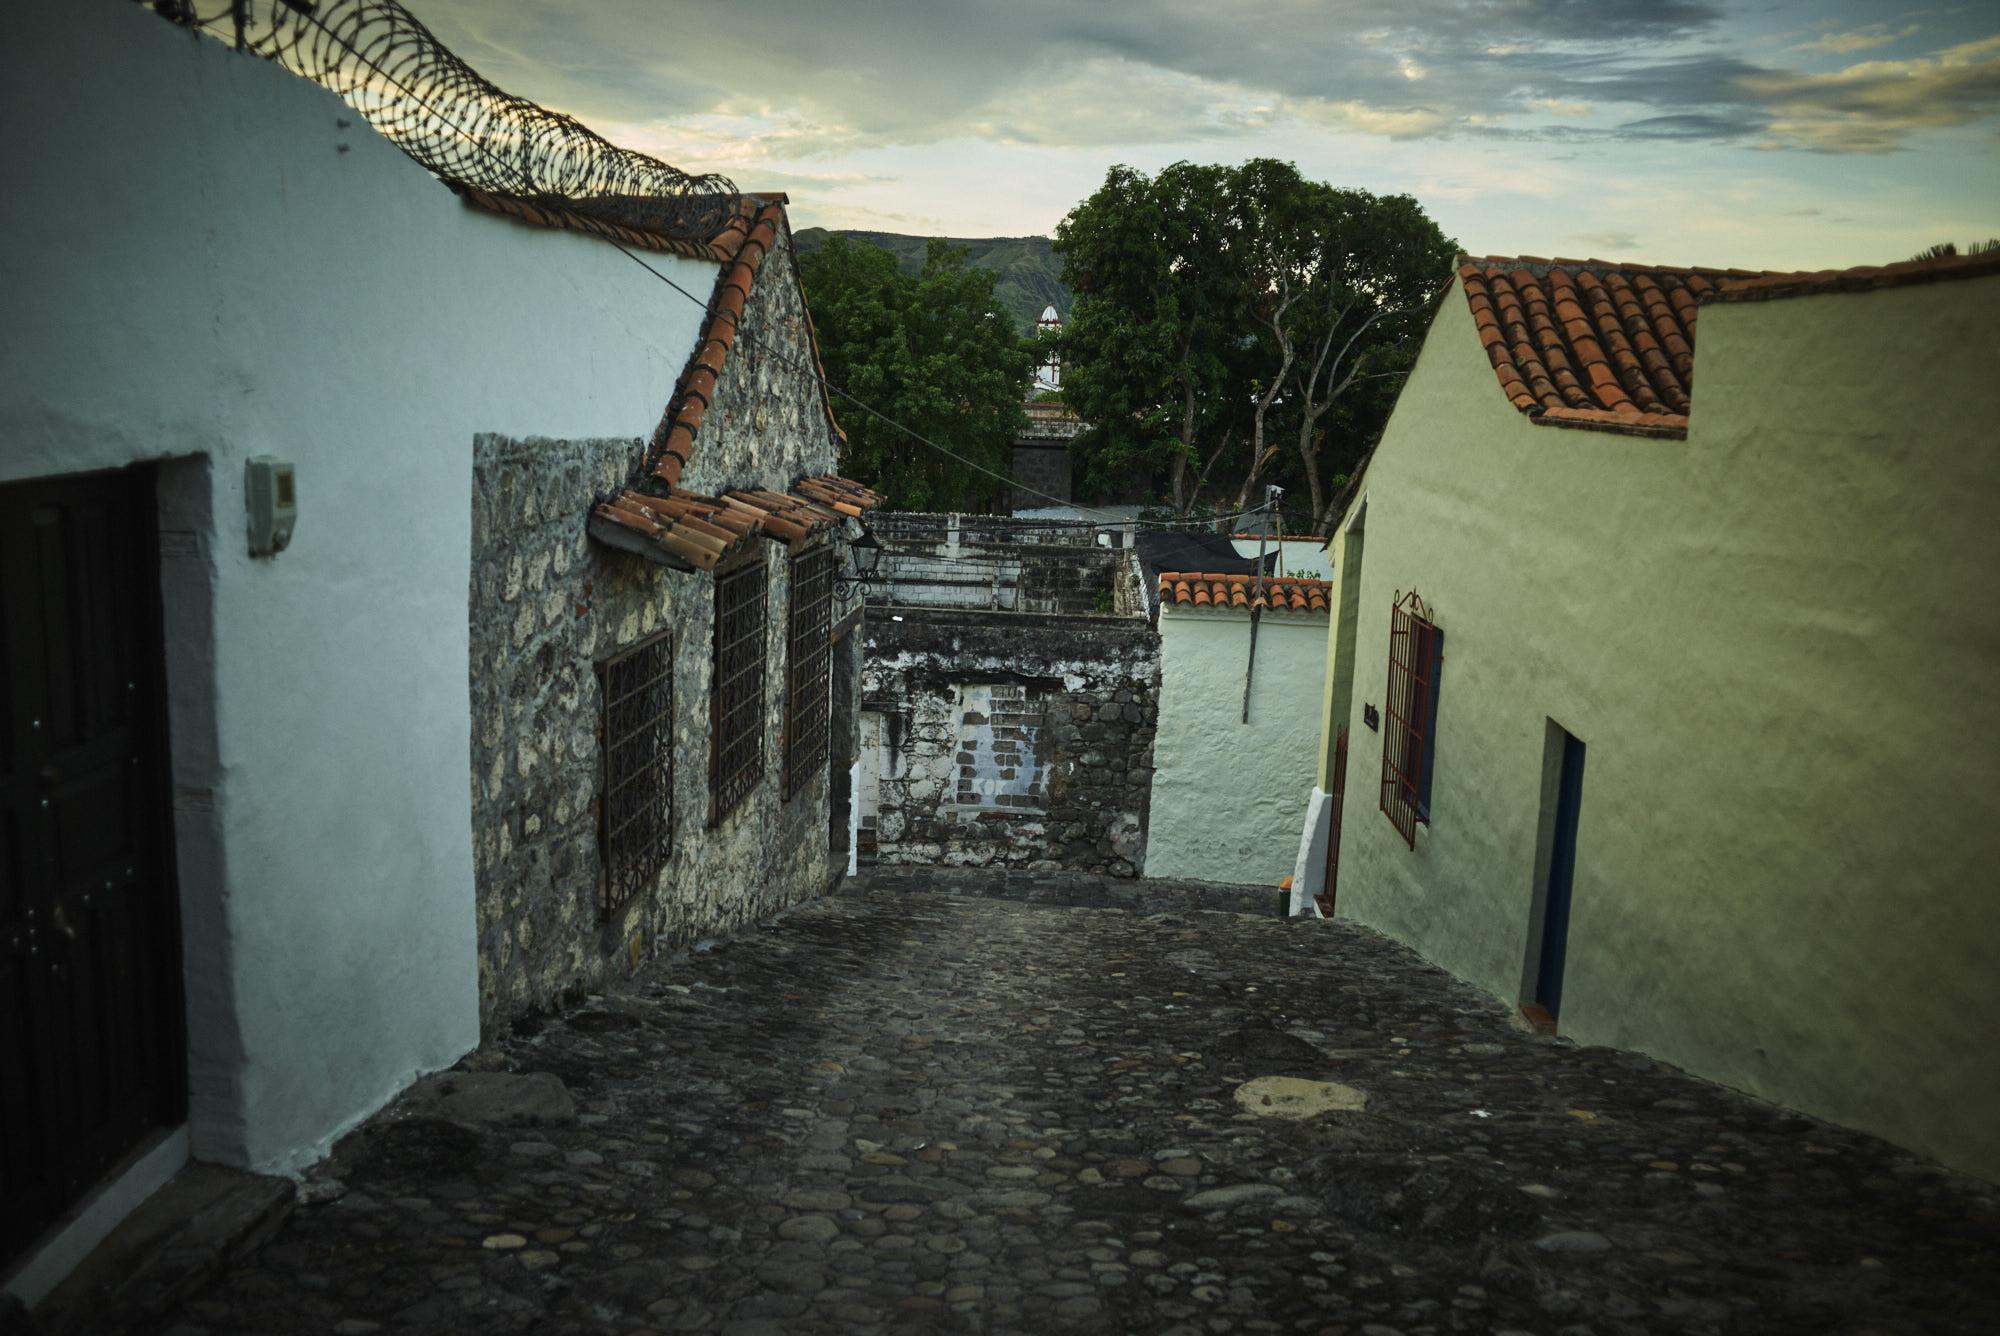 LOWRES-RADRACE-COLUMBIA-2018-CARLOS-1362.jpg